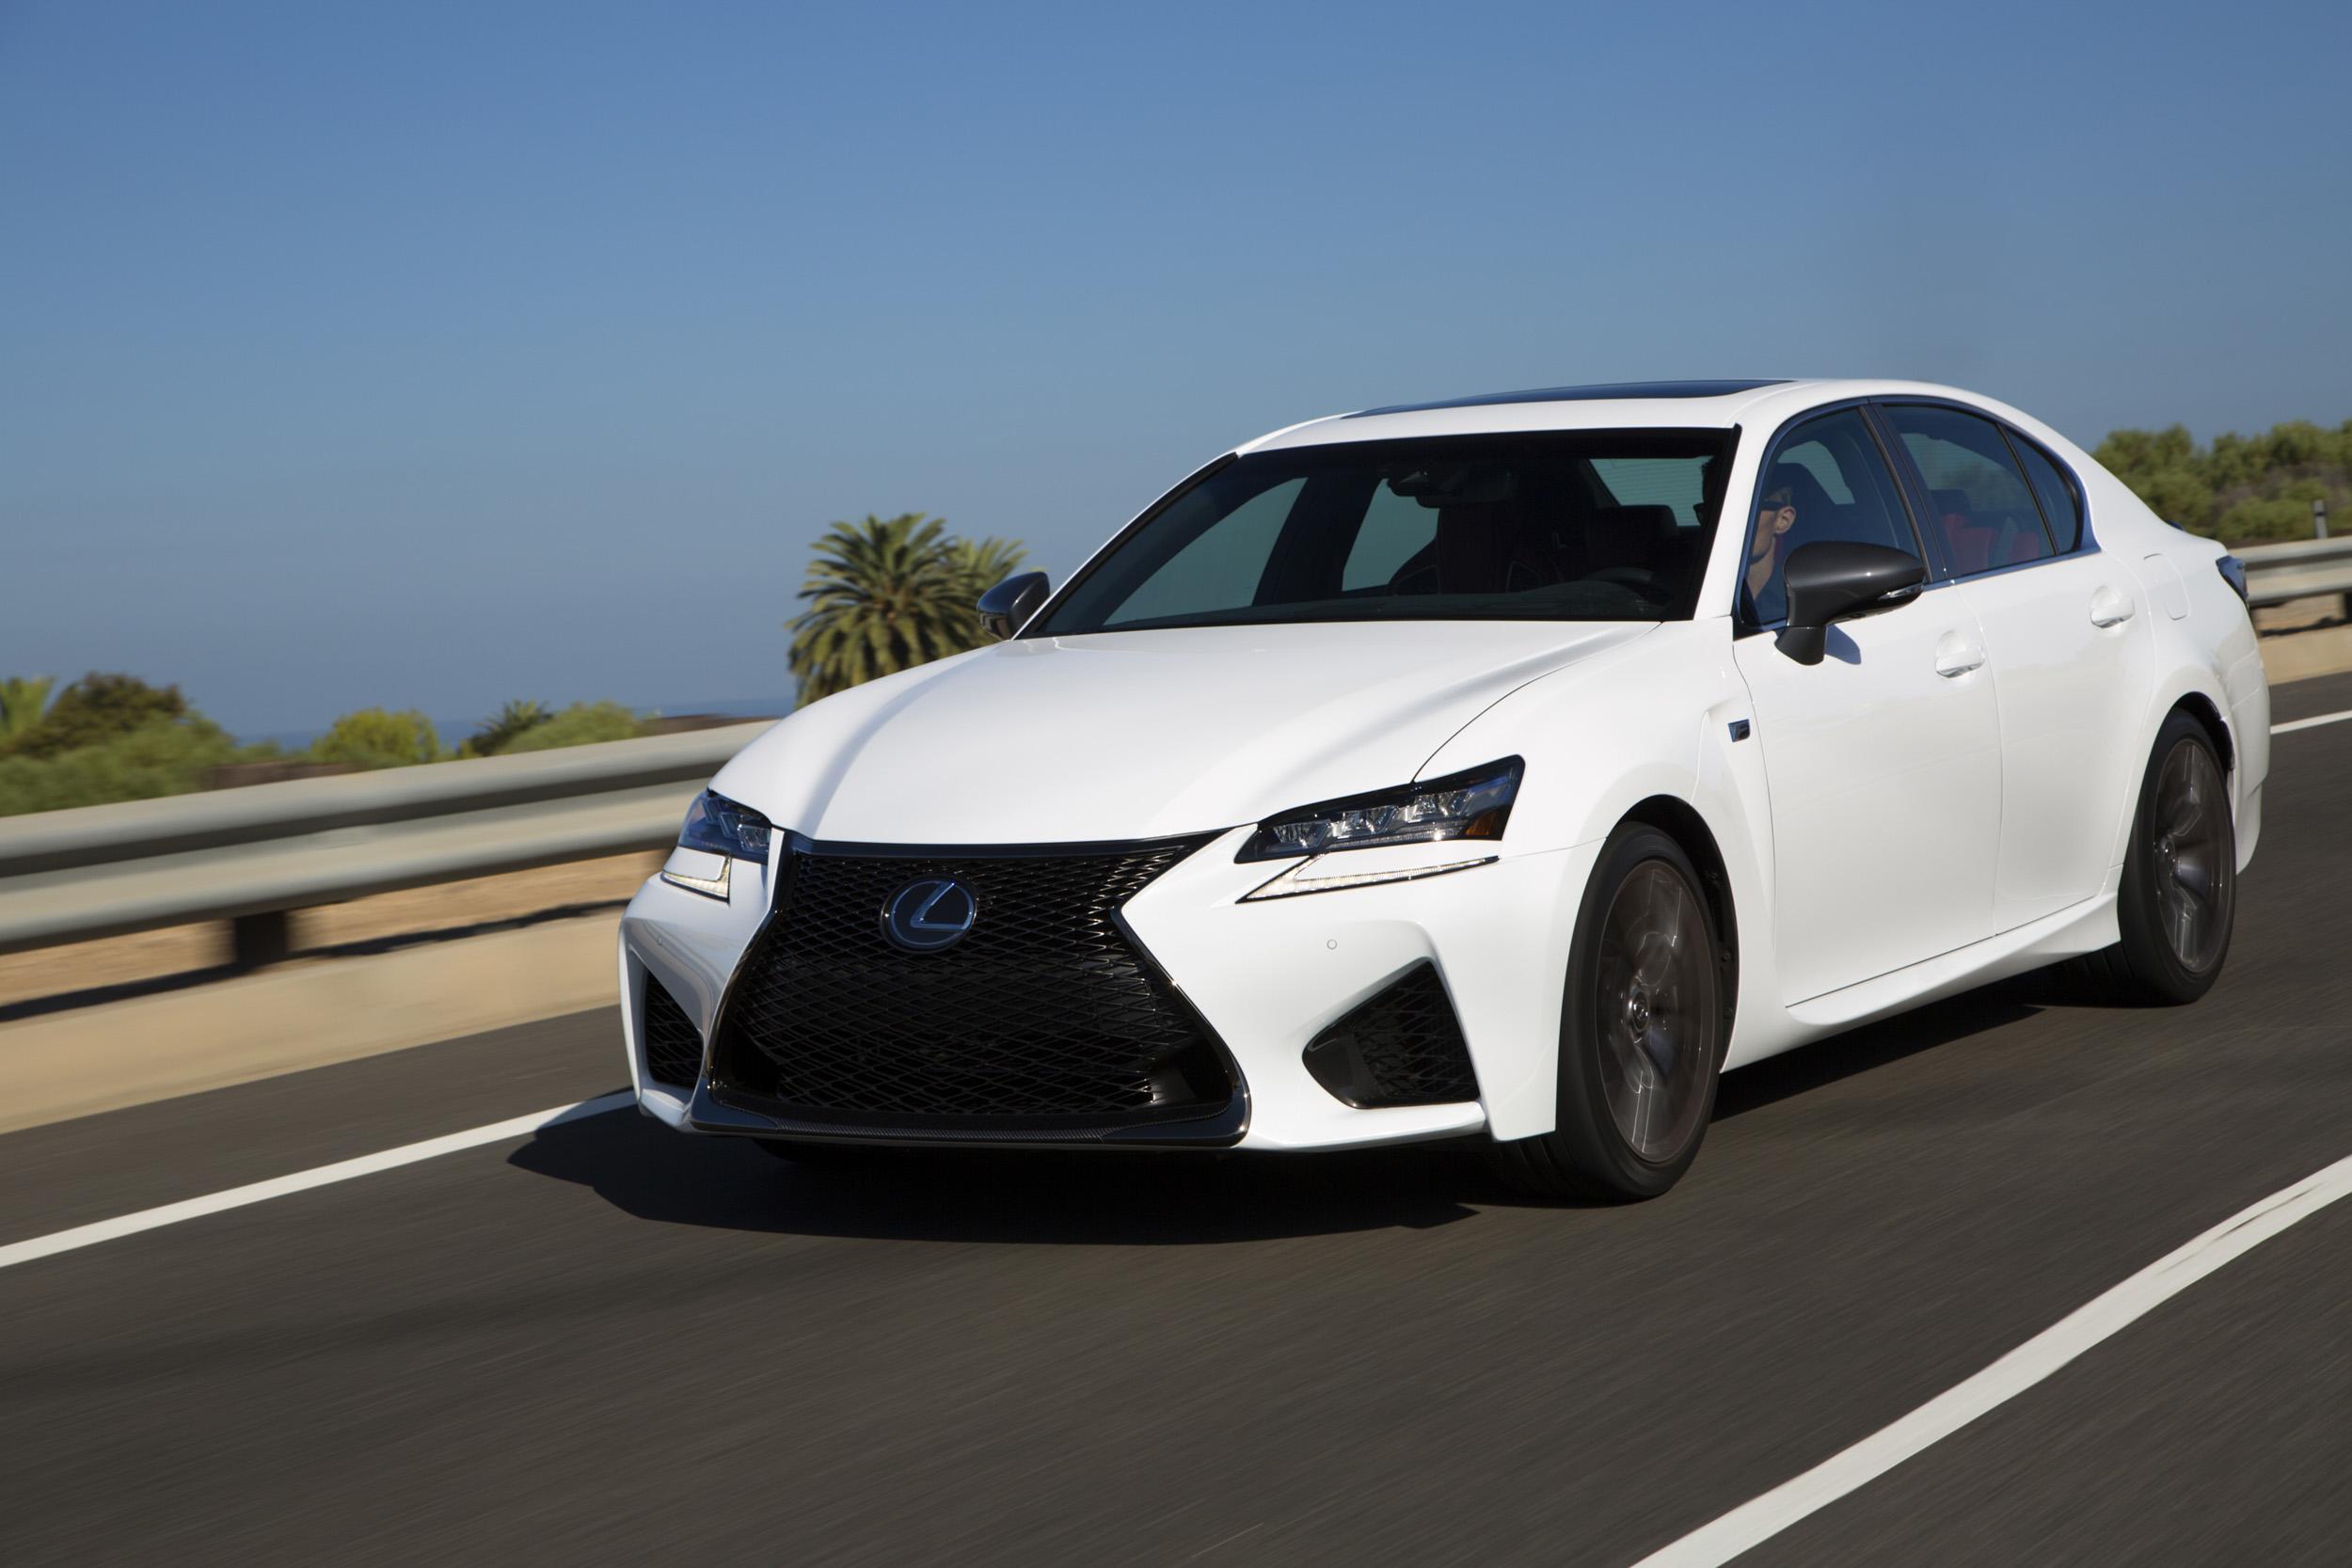 Lexus brings class to the automobile world • Carfanatics Blog